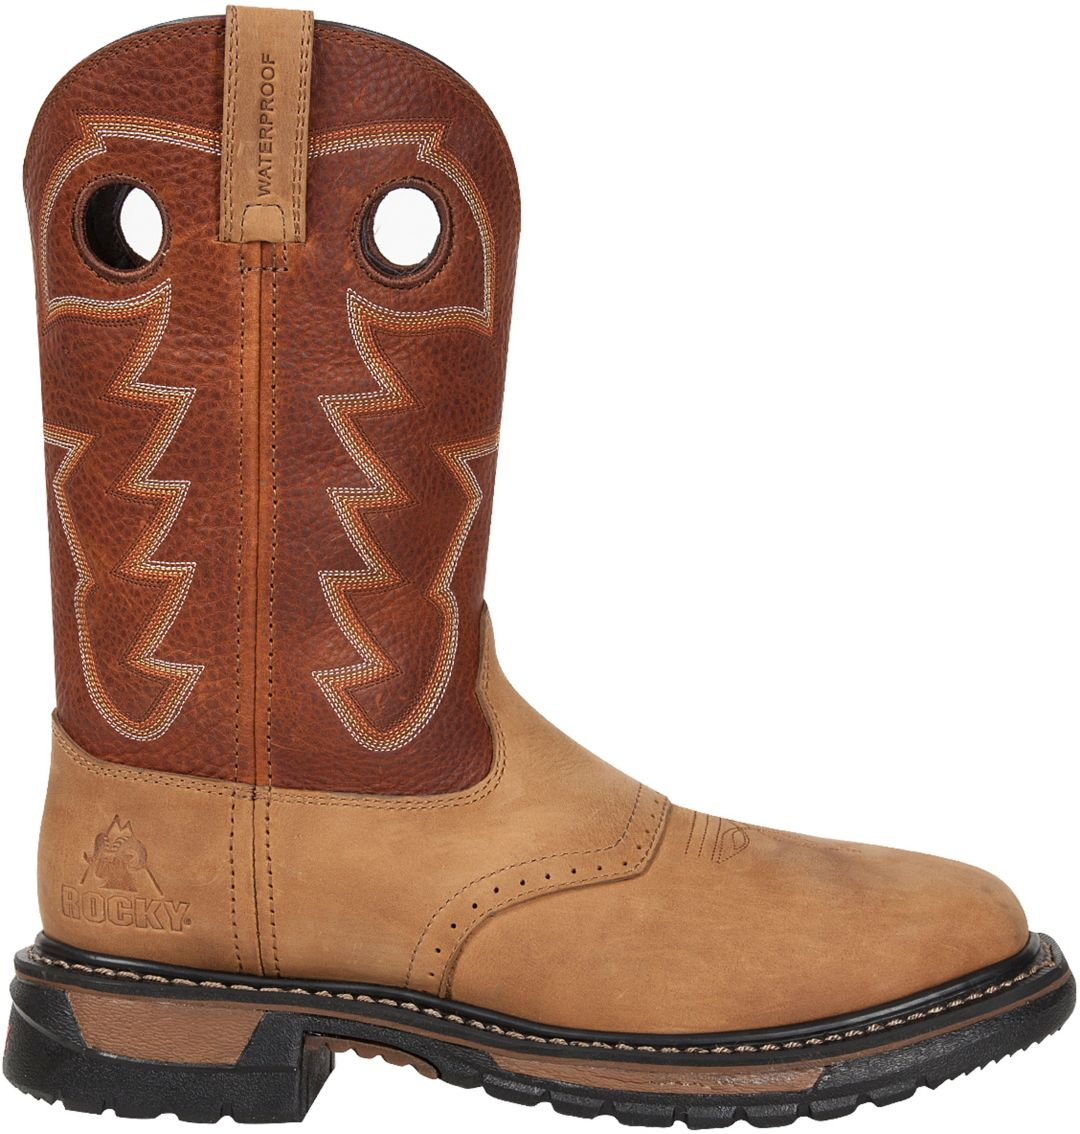 "73dae3113d3 Rocky Men's Original Ride 11"" Steel Toe Western Work Boots"